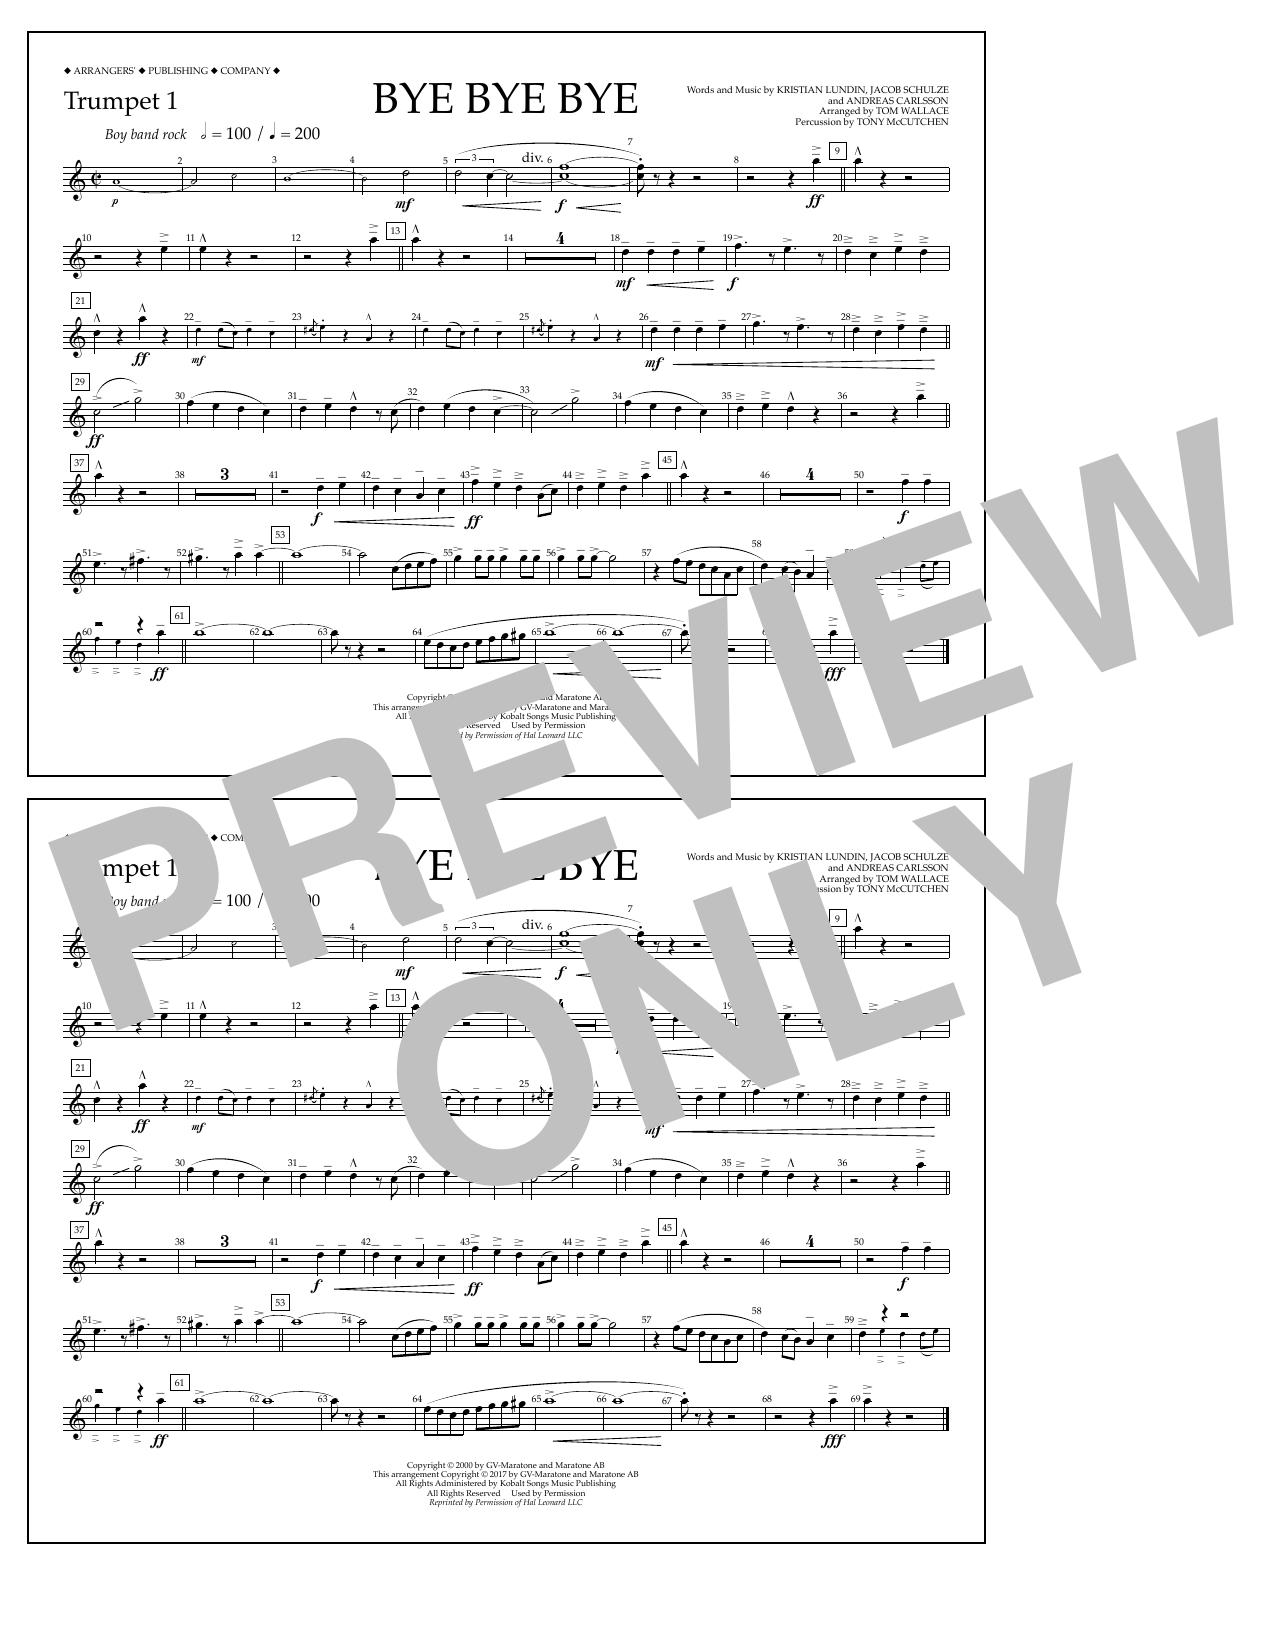 Bye Bye Bye - Trumpet 1 Sheet Music